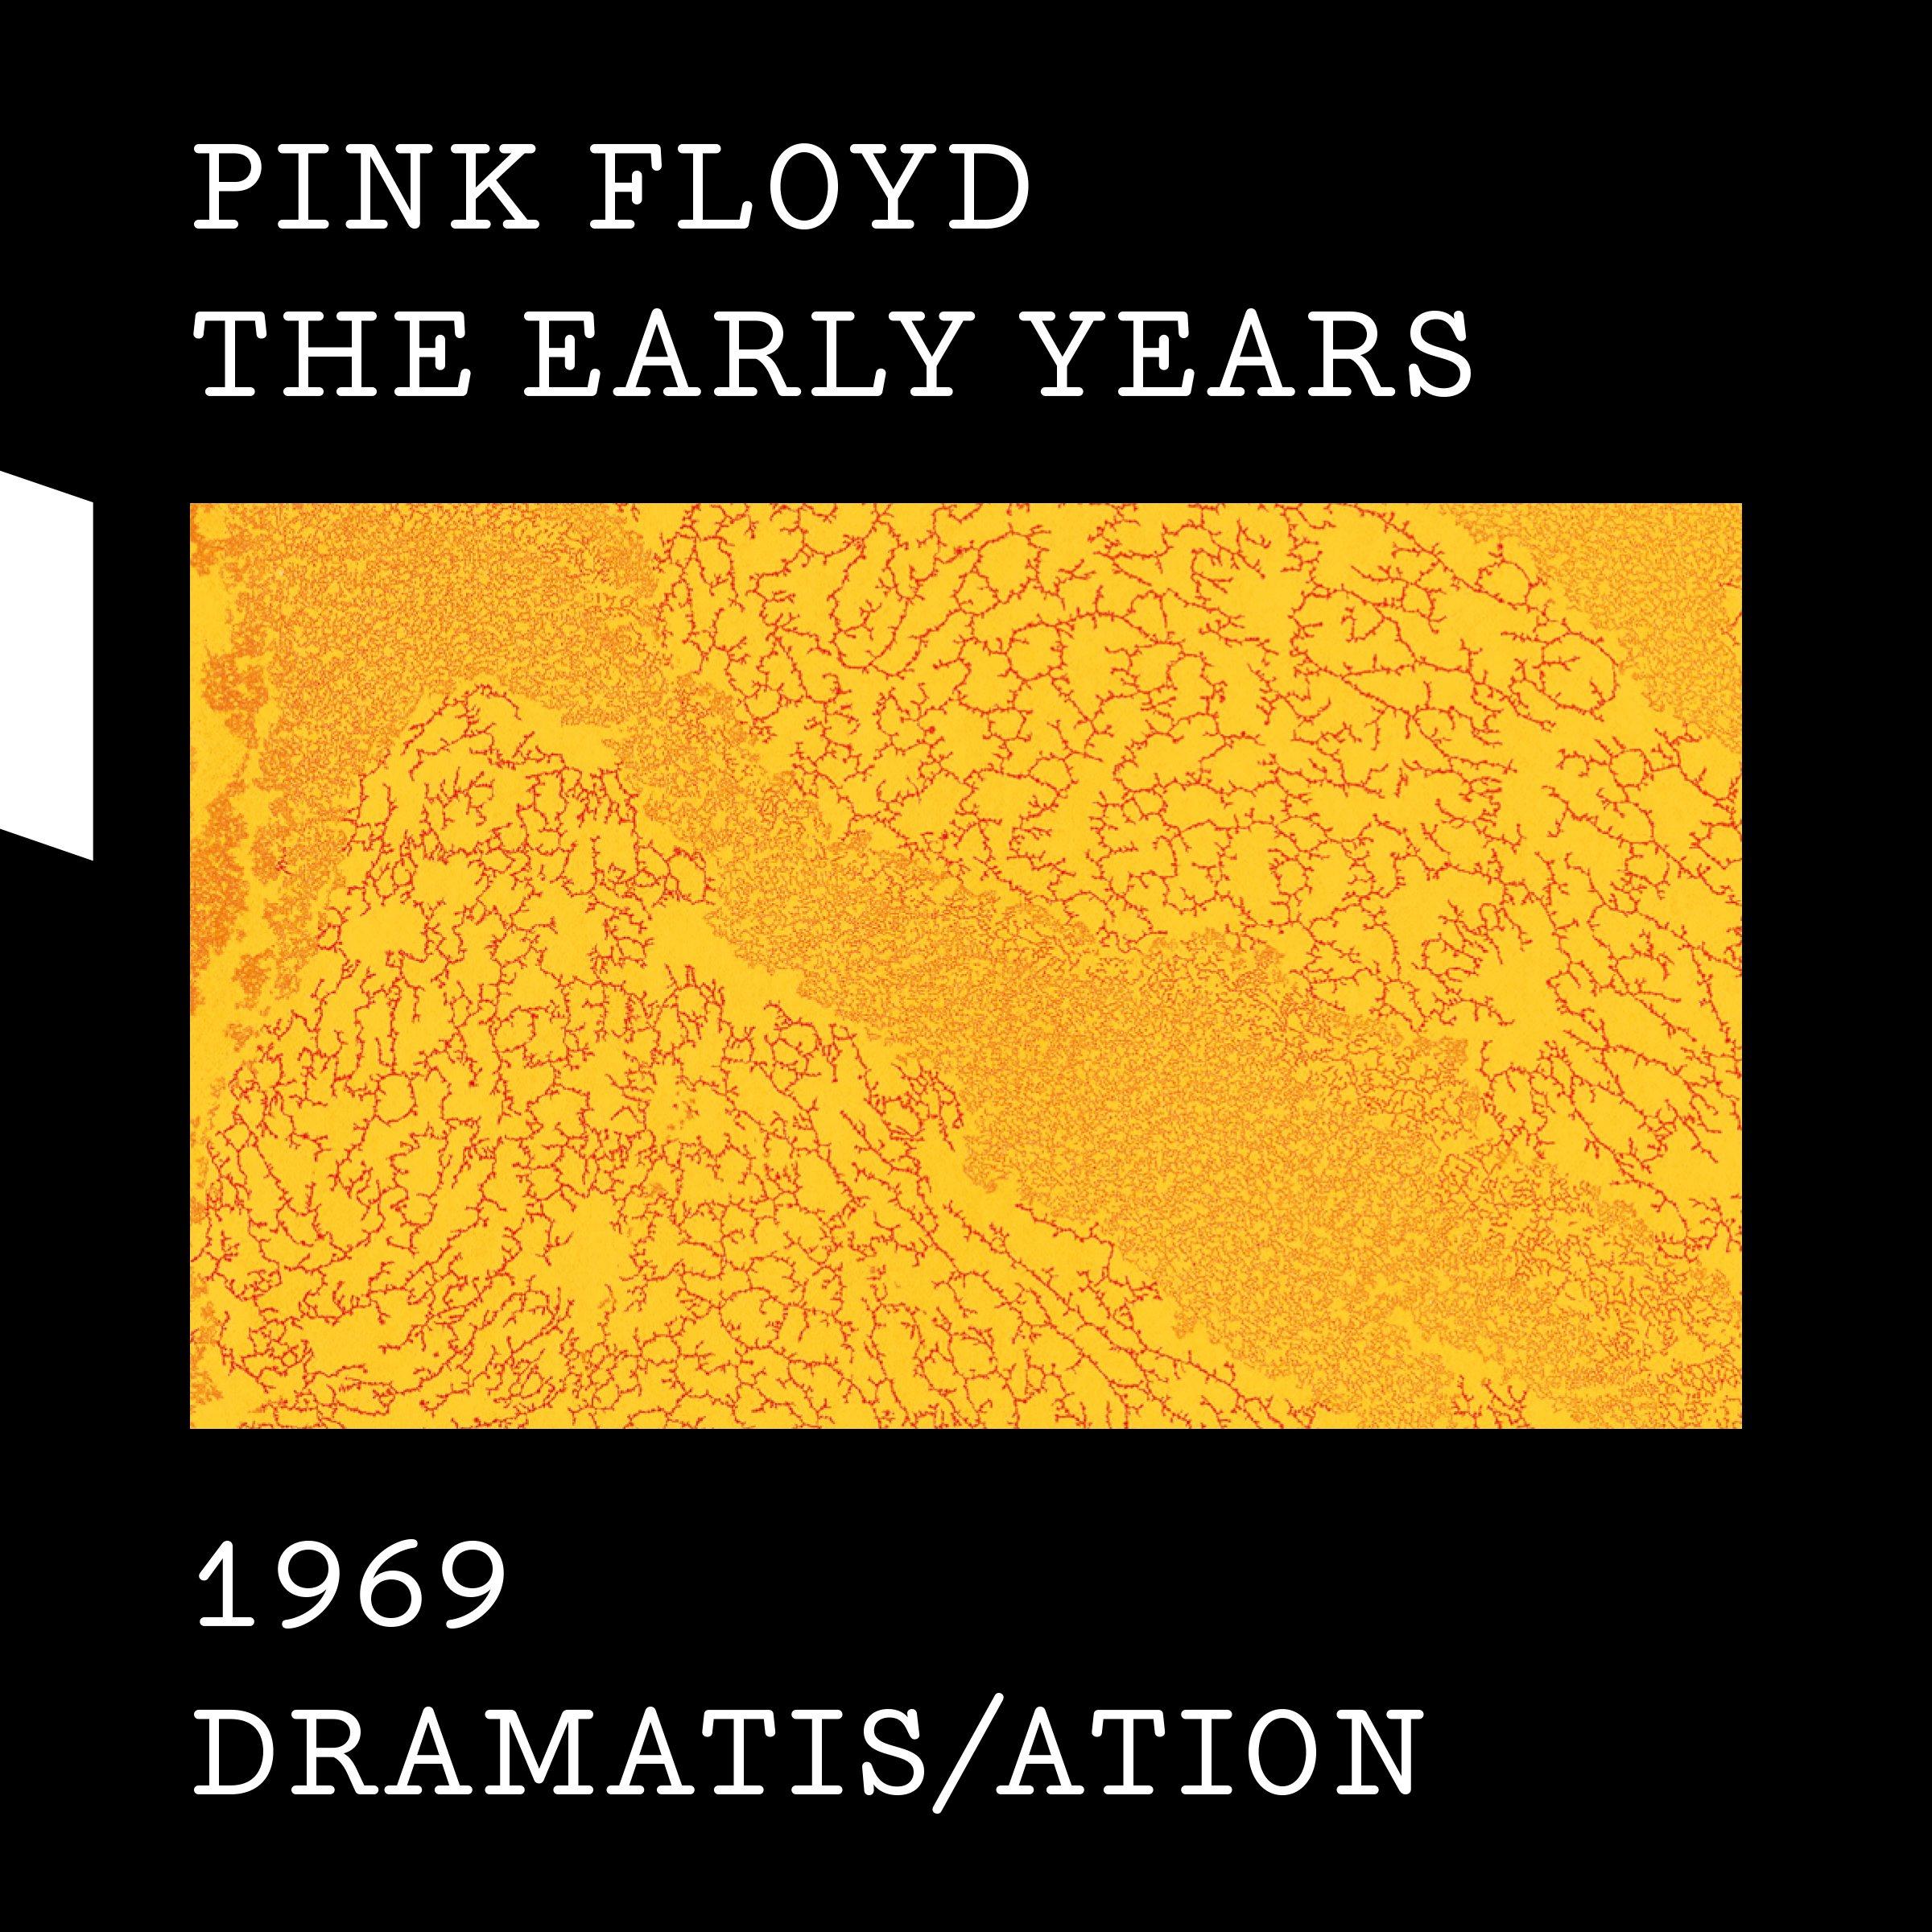 Pink Floyd 1969 Dramatis/ation płyta CD + DVD + BL